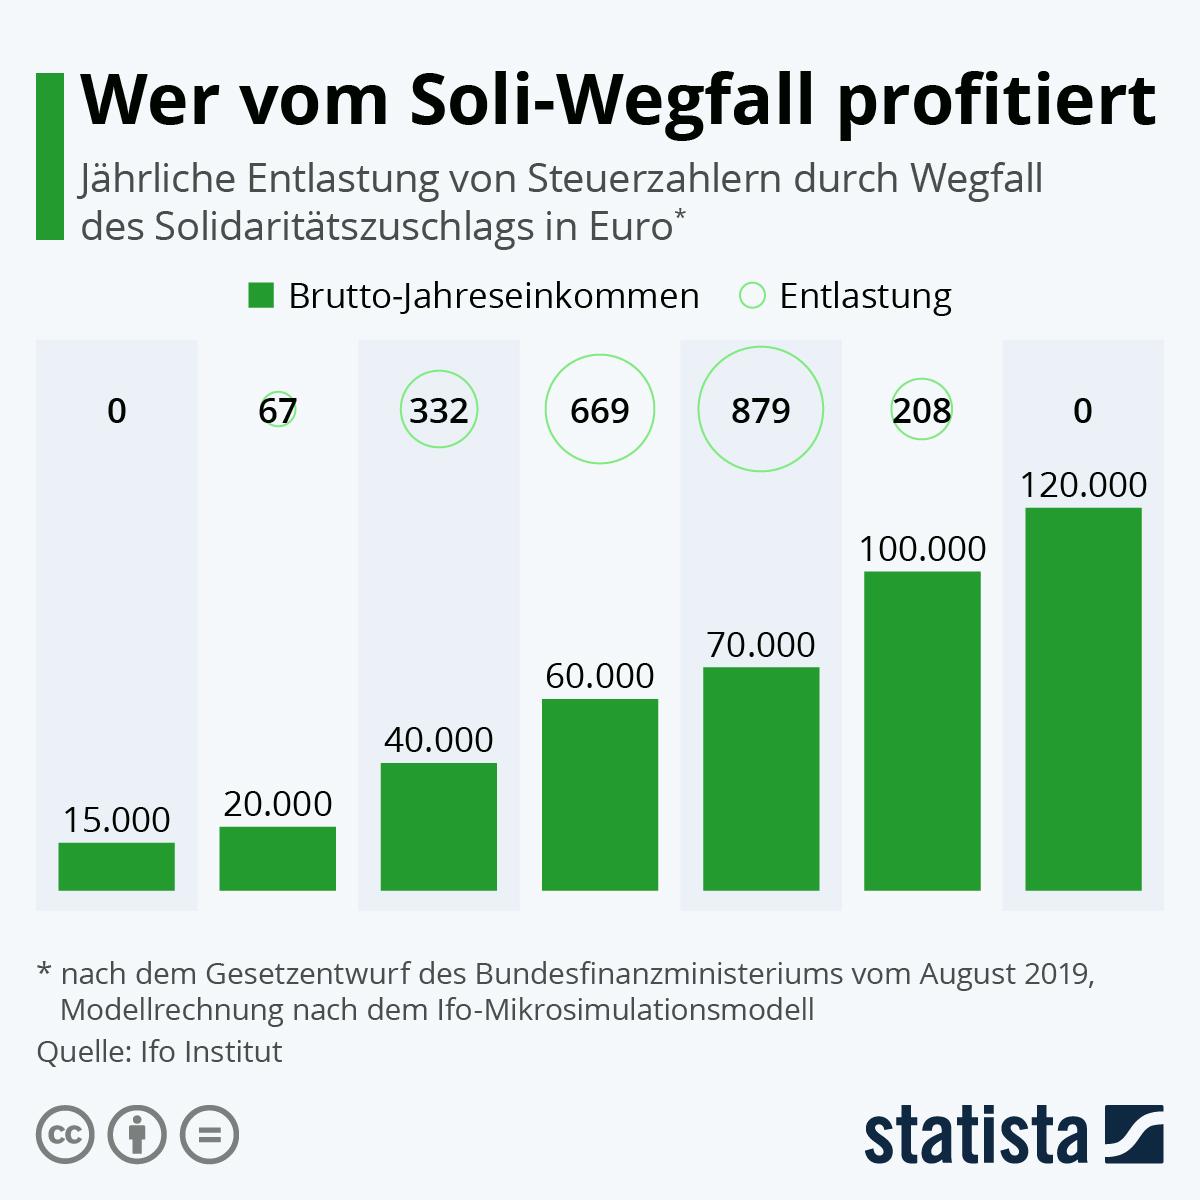 Infografik: Wer vom Soli-Wegfall profititiert | Statista